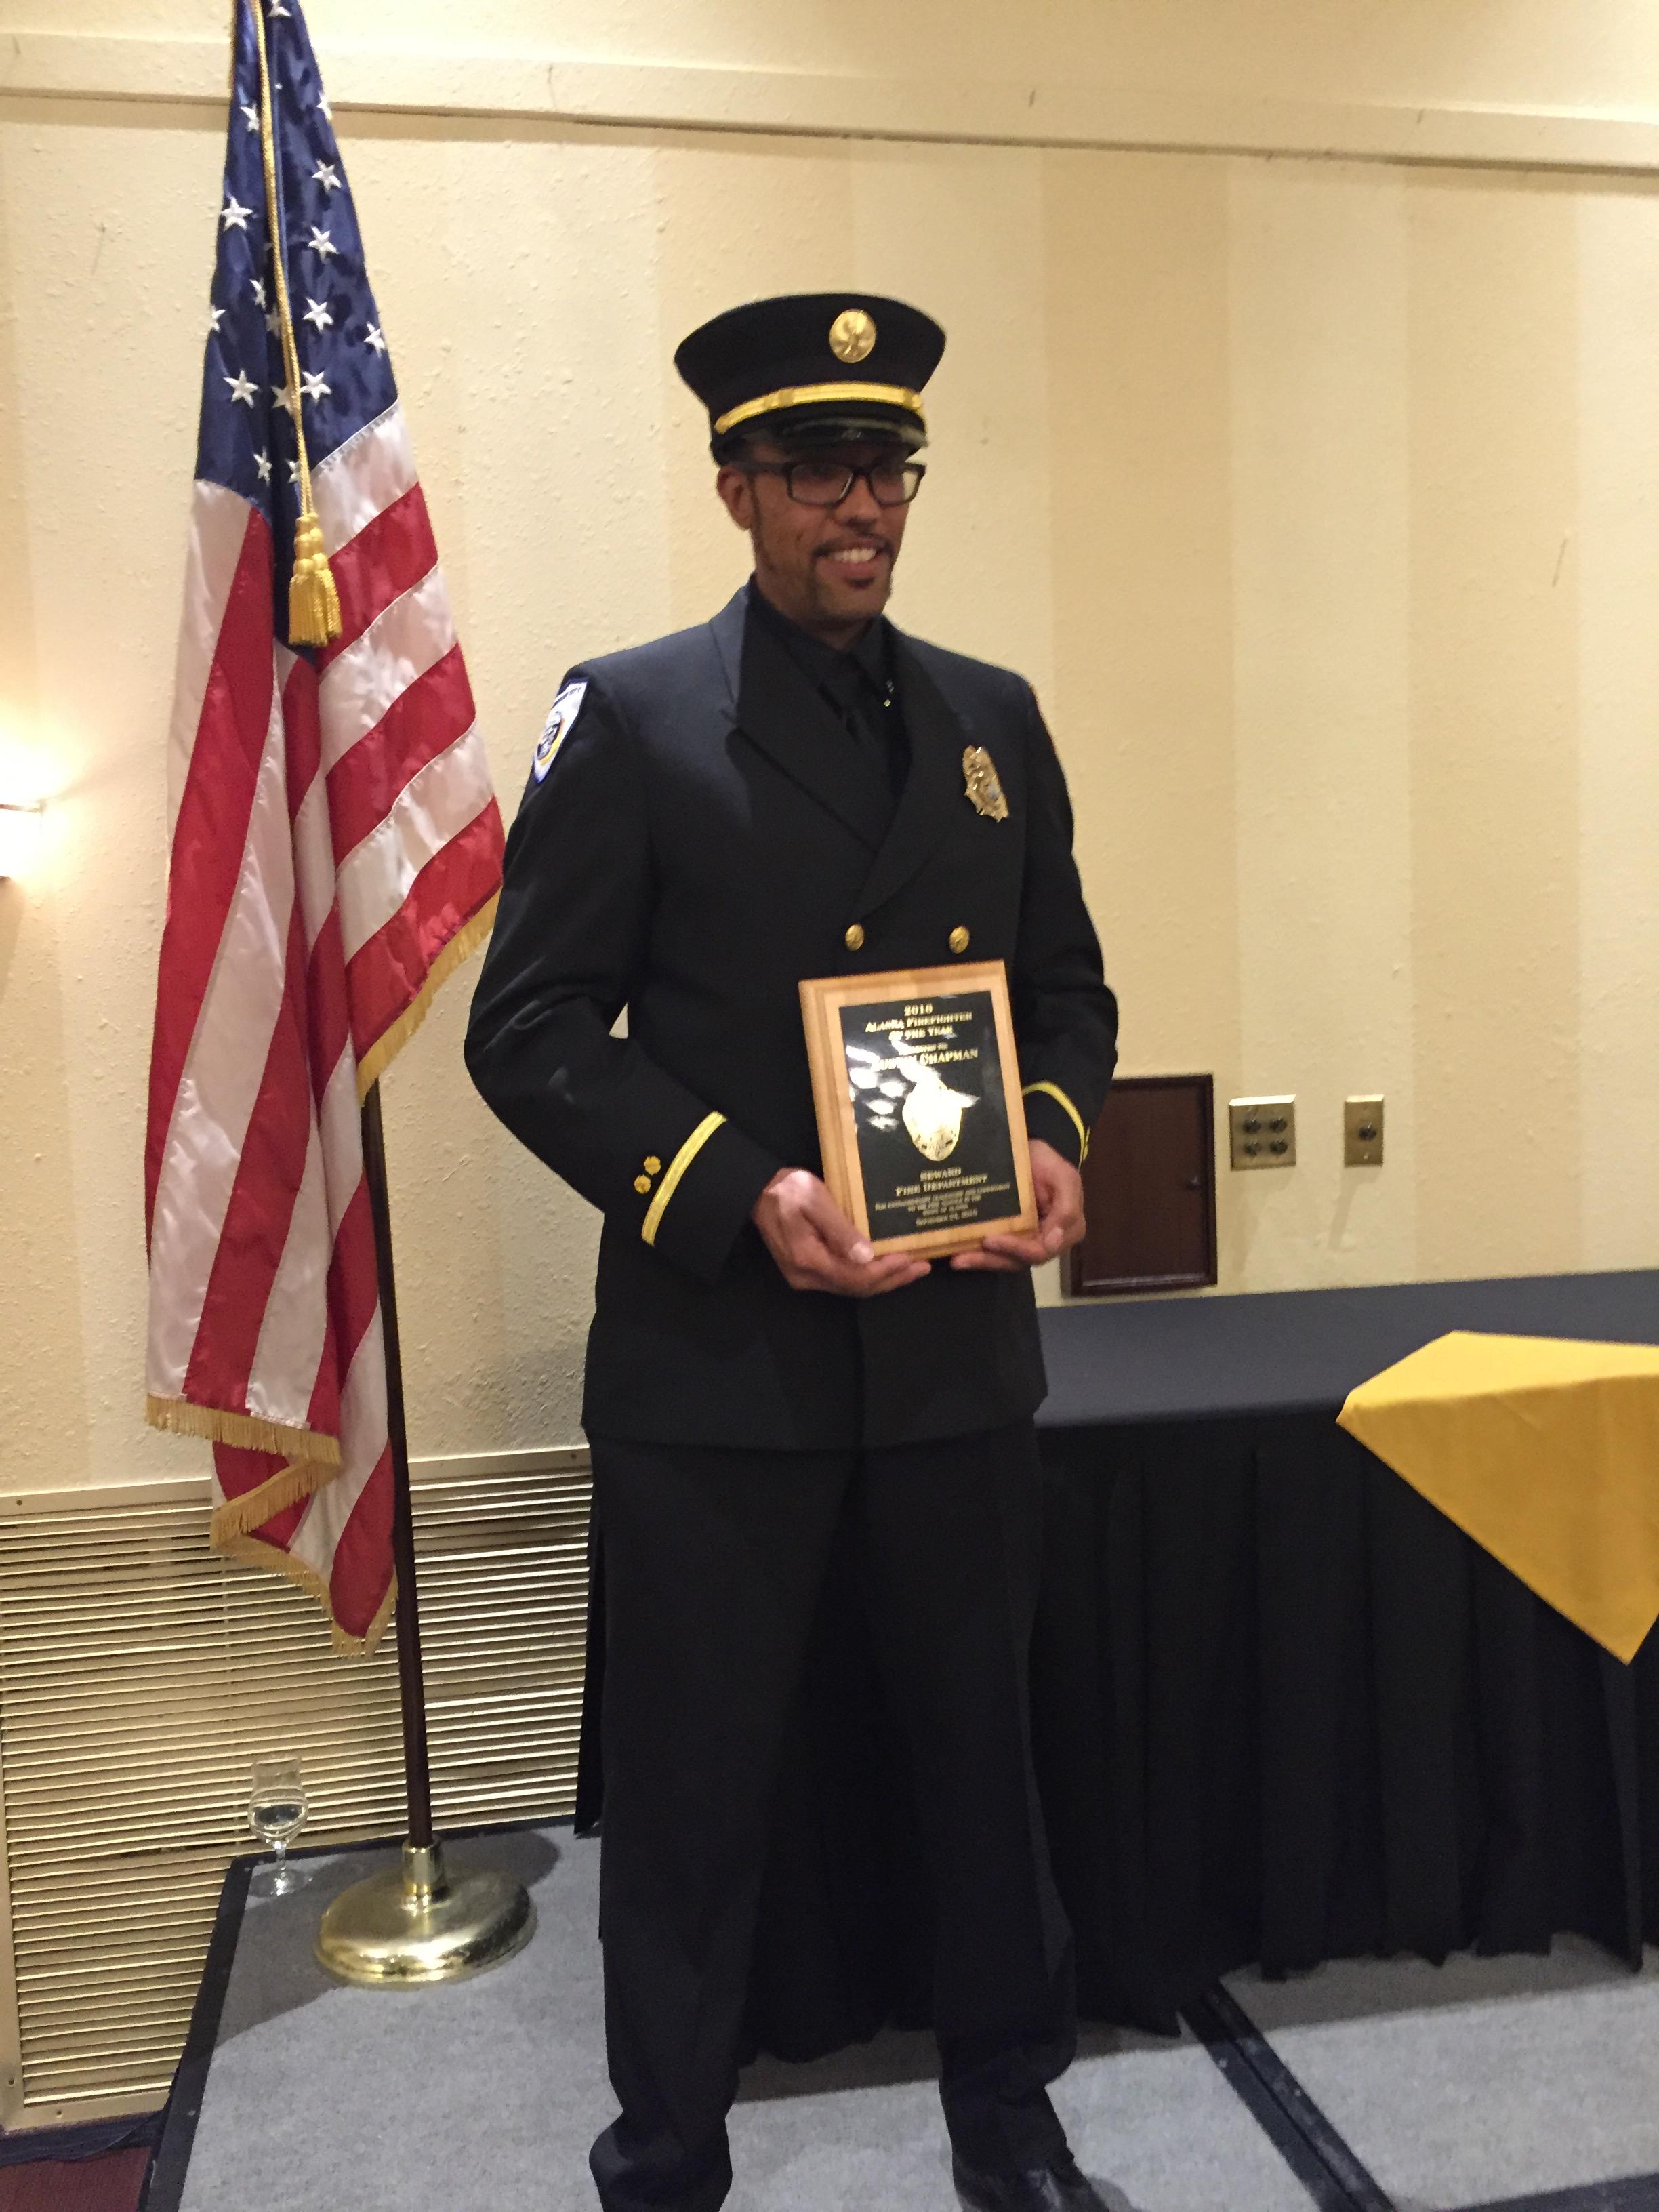 Lt. Austin Chapman